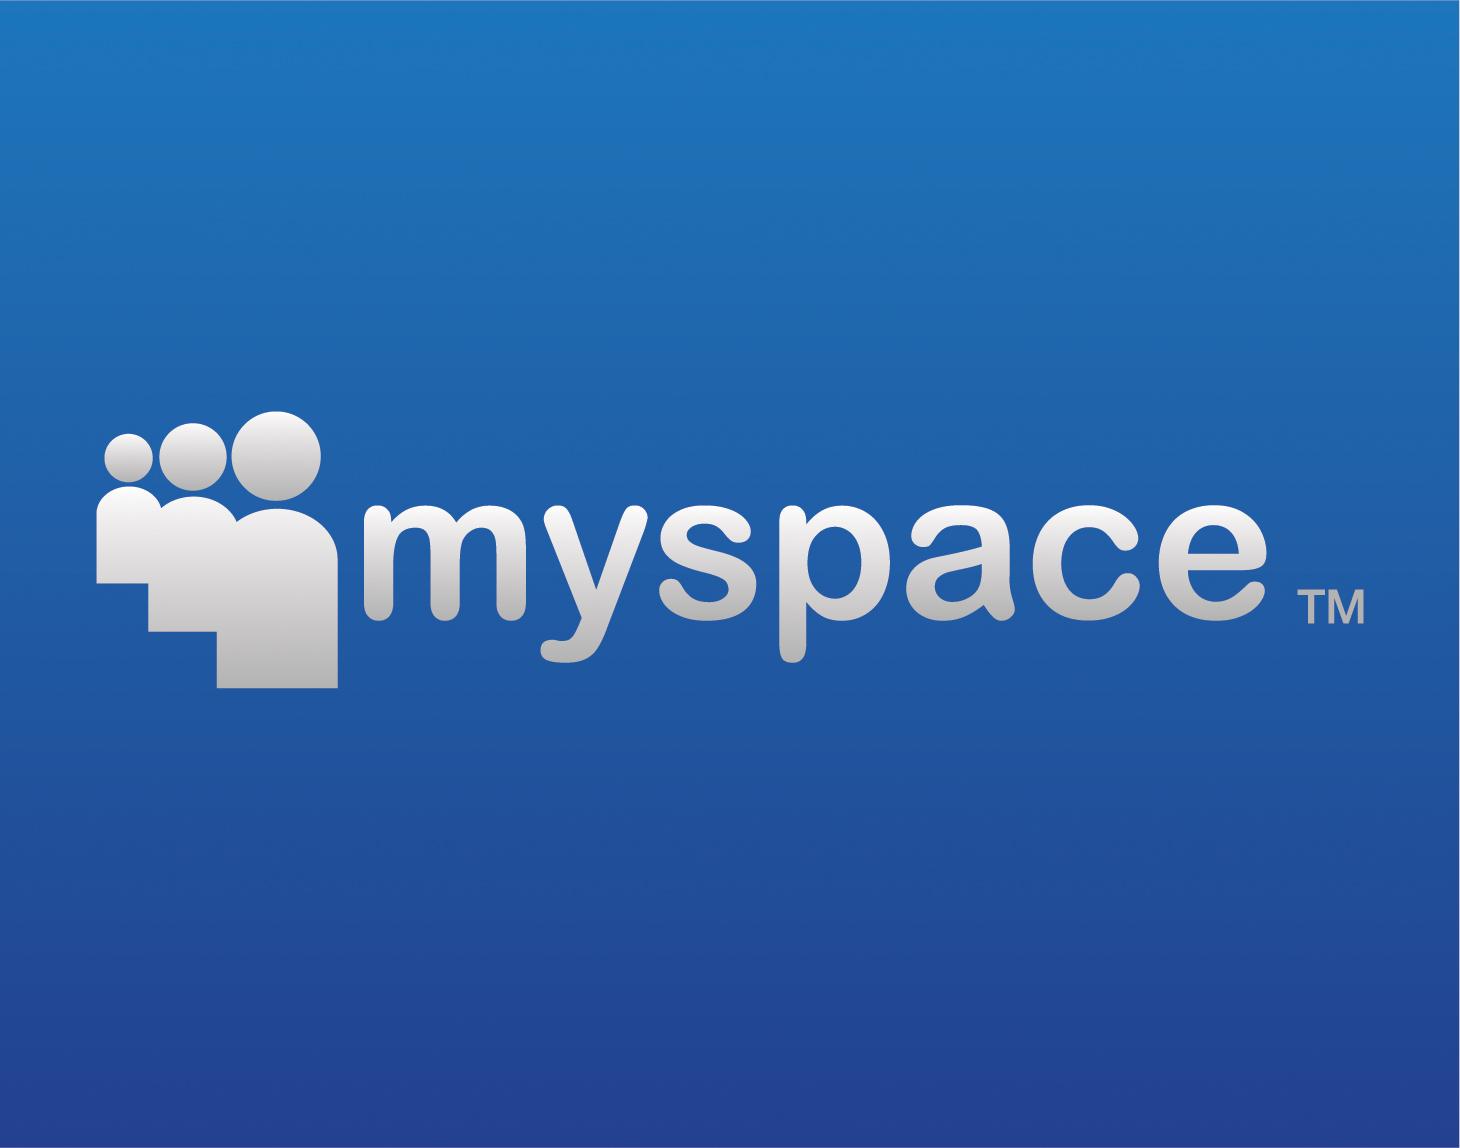 Myspace pictures foto 88